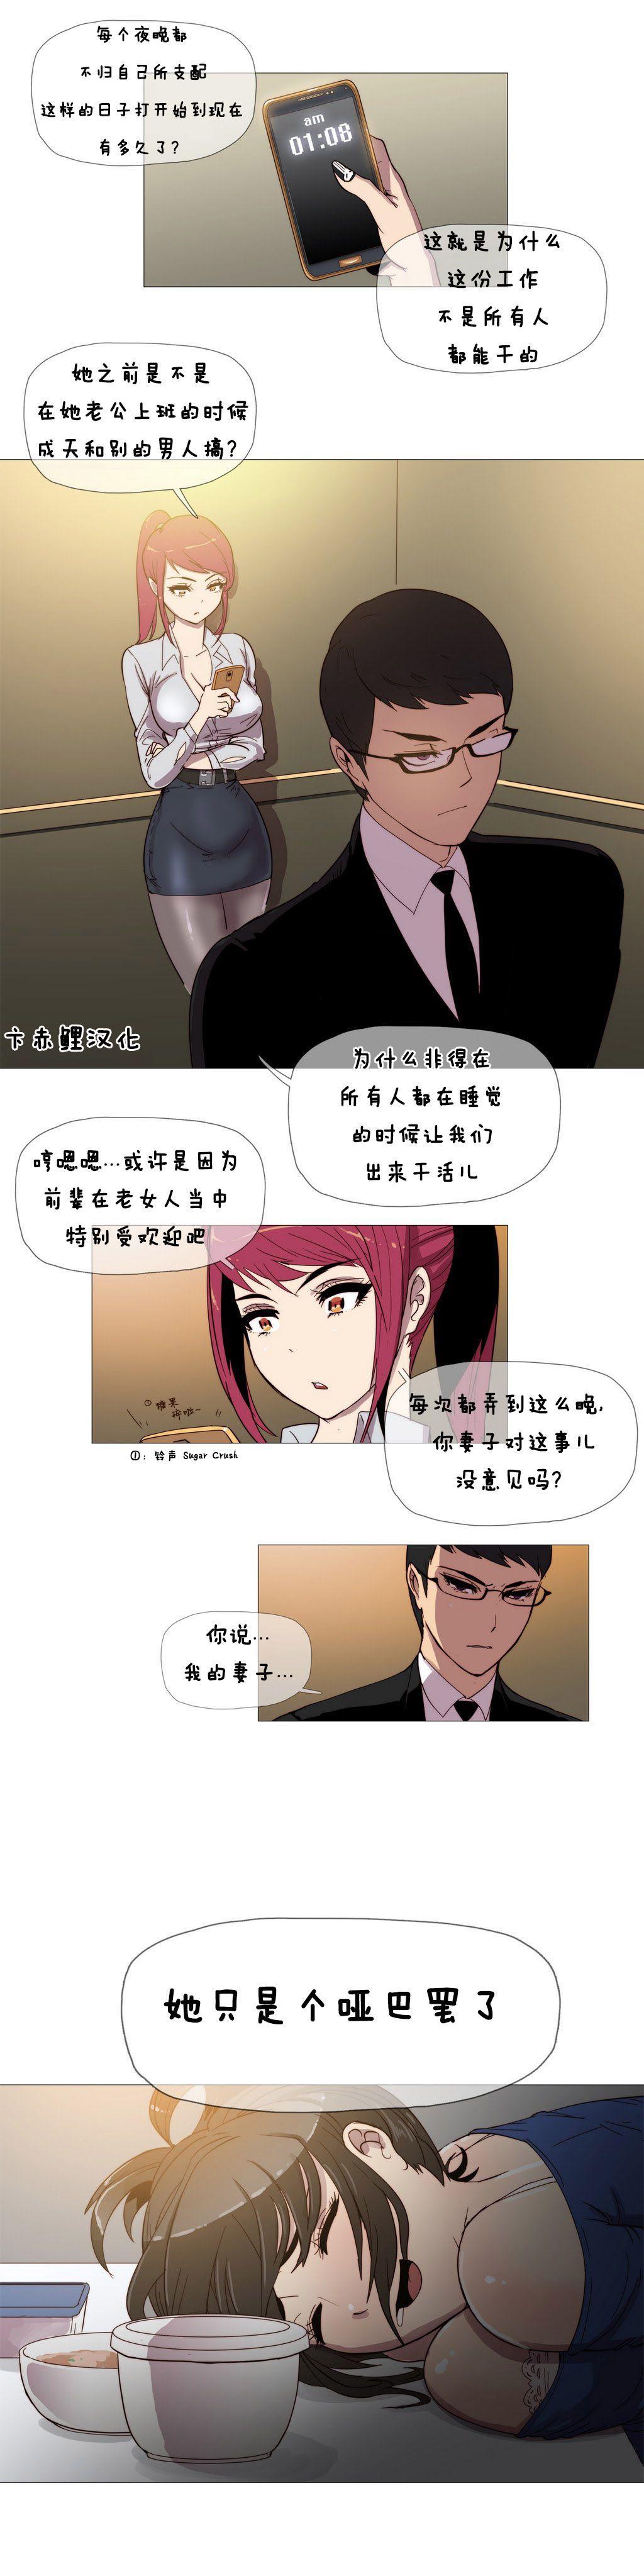 HouseHold Affairs 【卞赤鲤汉化】1~15话 44